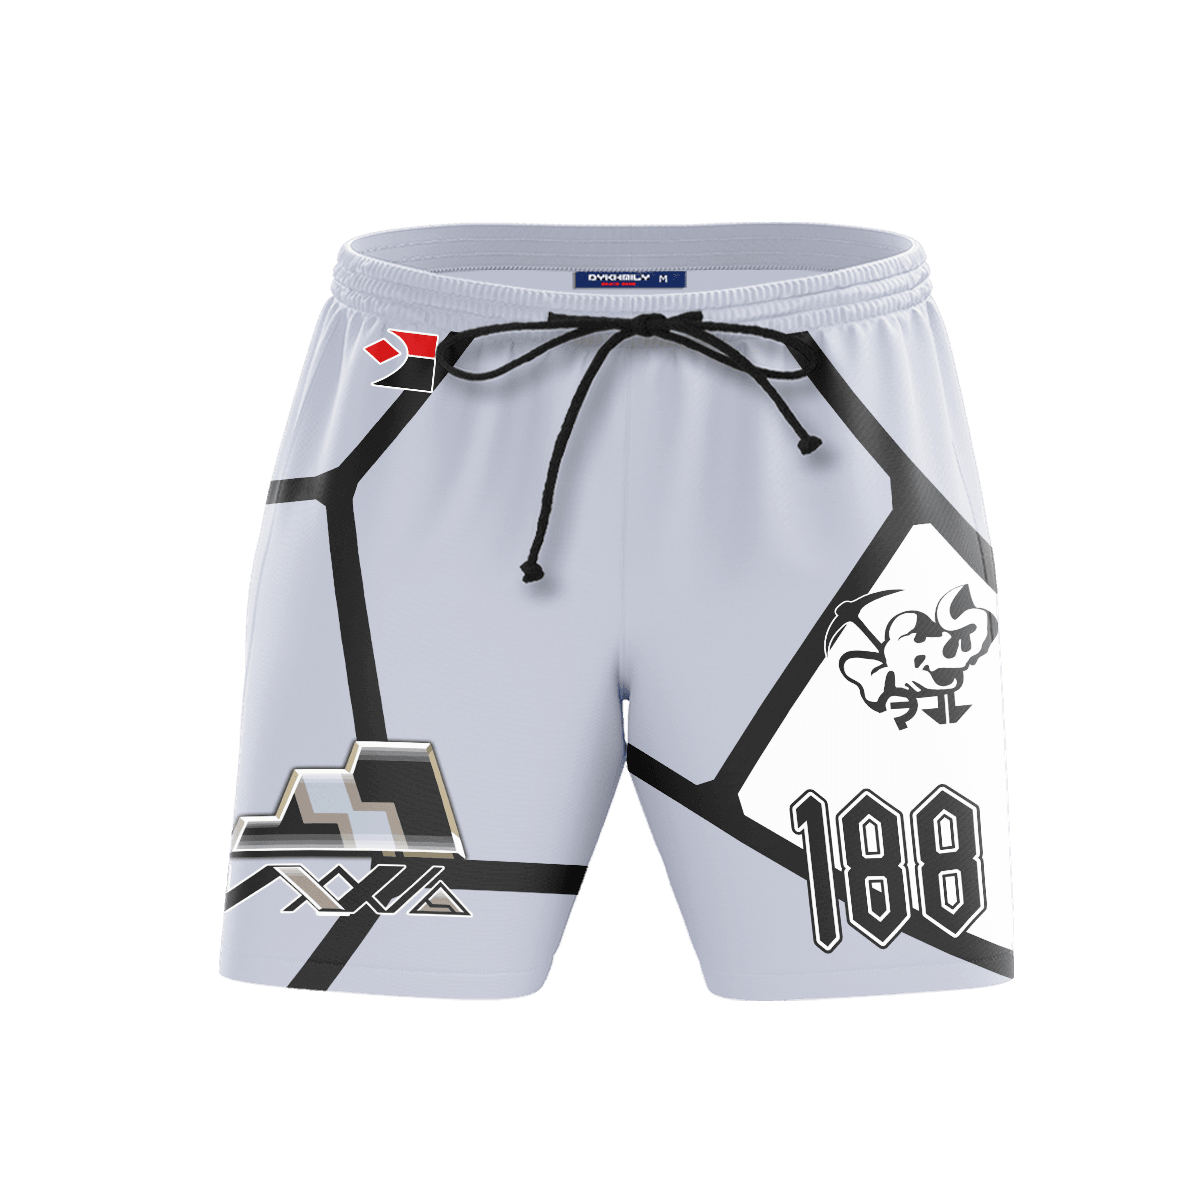 Pokemon Rock Uniform Beach Shorts FDM3107 S Official Anime Swimsuit Merch